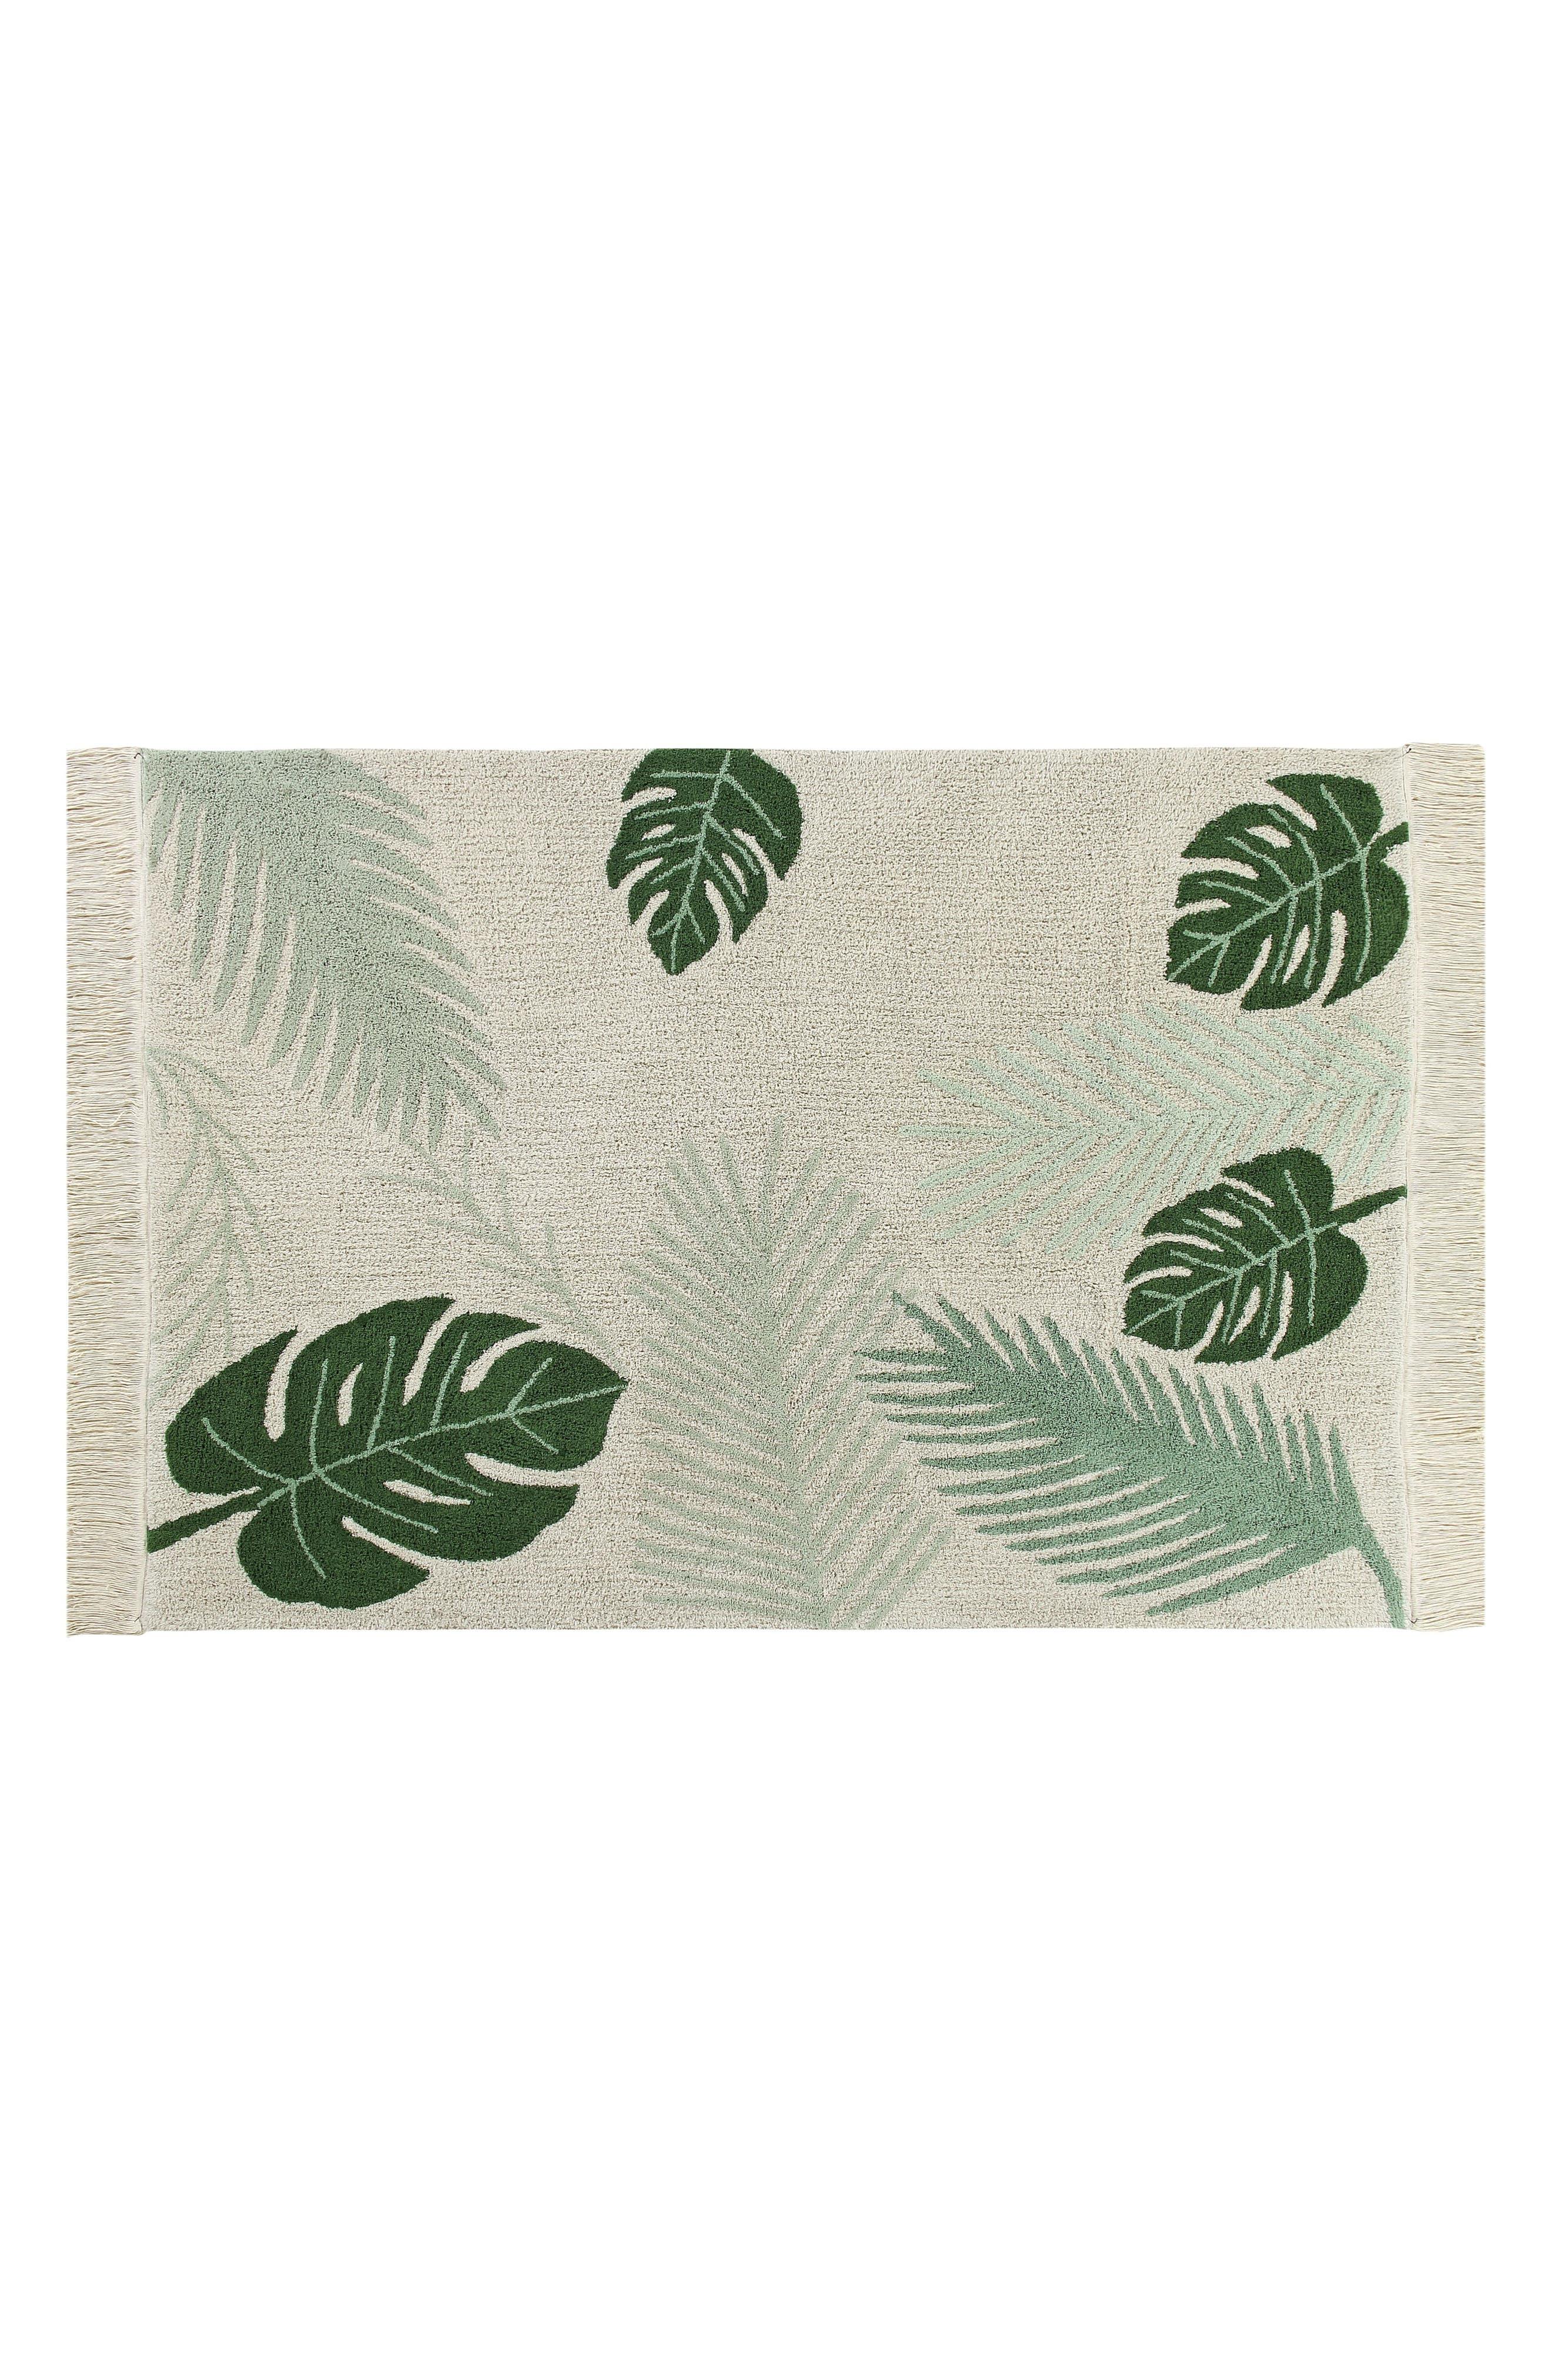 Tropical Rug,                             Main thumbnail 1, color,                             Tropical Green